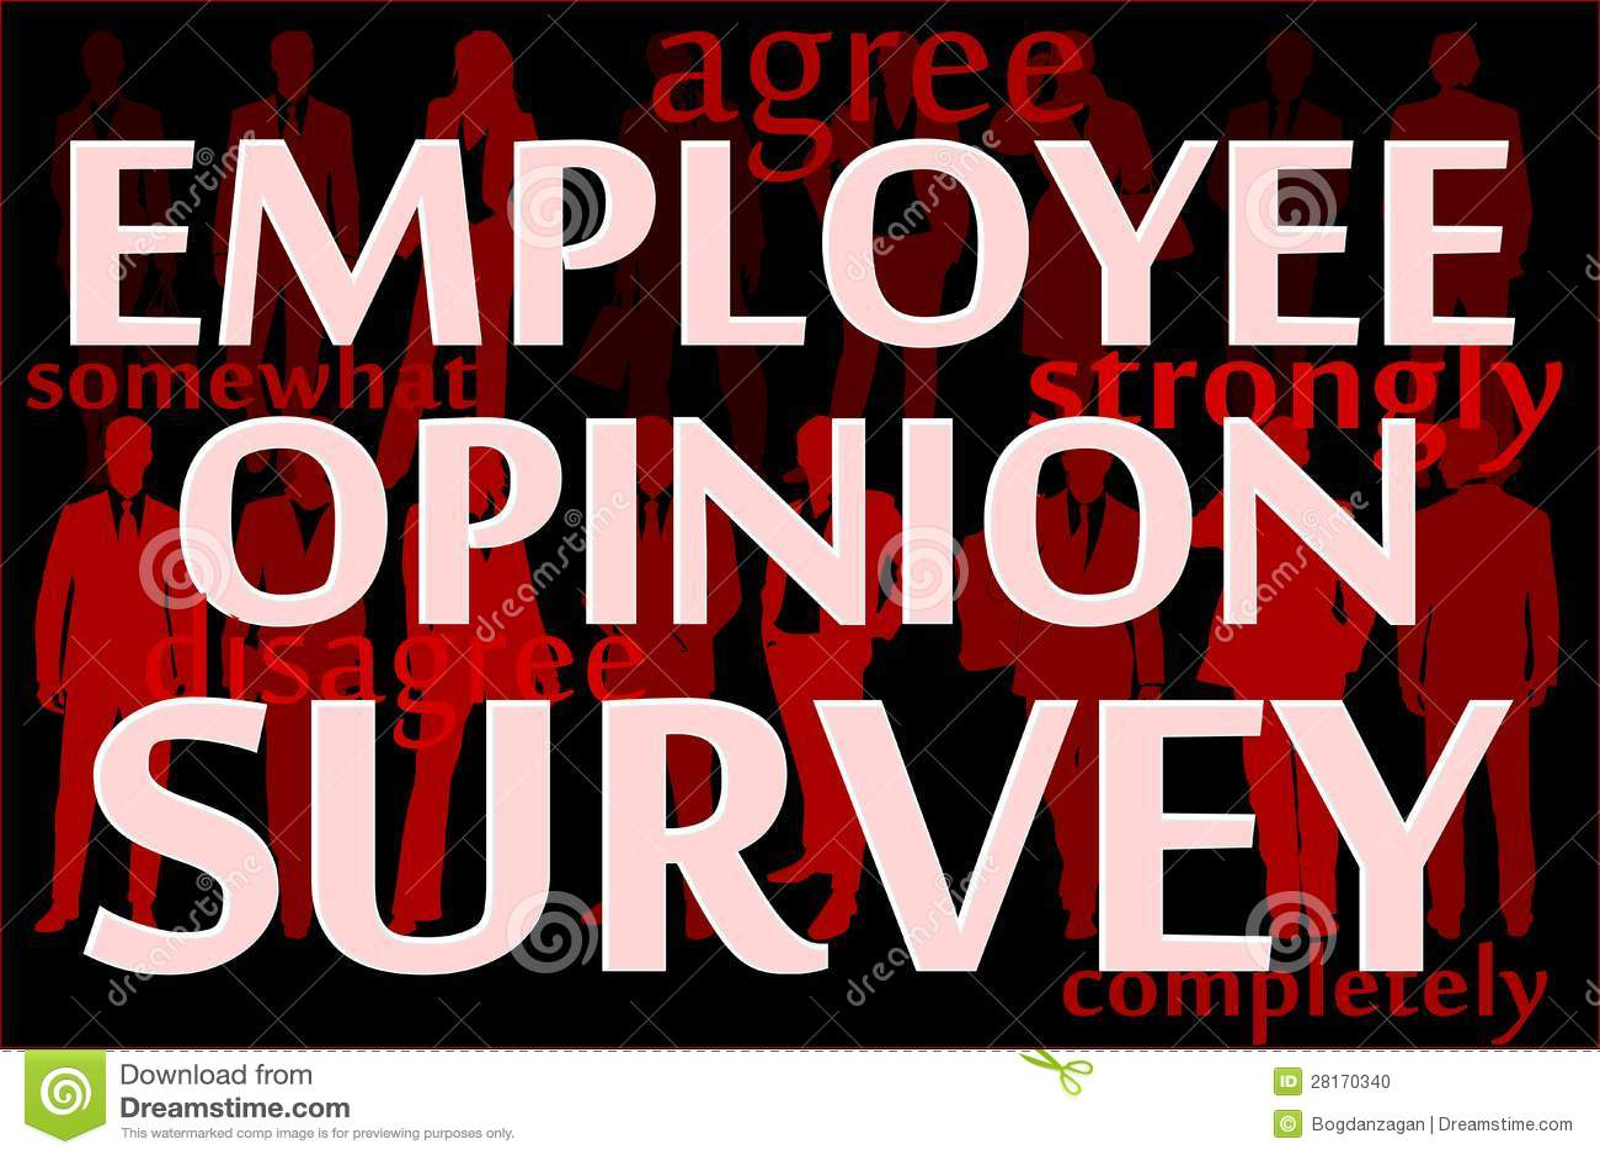 employee opinion survey stock vector  illustration of